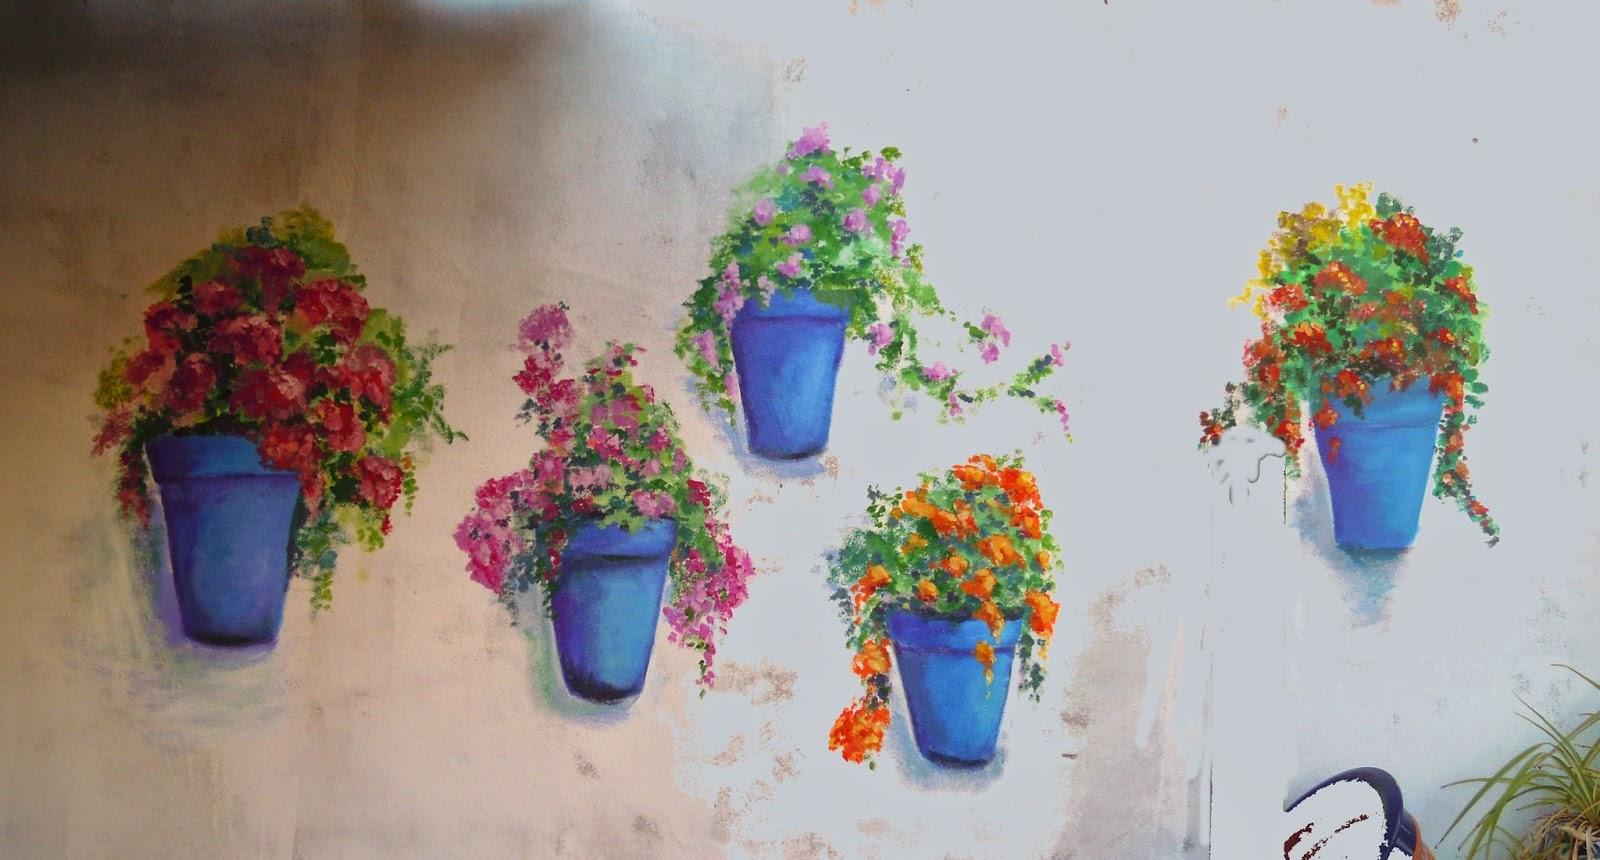 Pinturas de sousa macetas en la pared - Macetas para pared ...